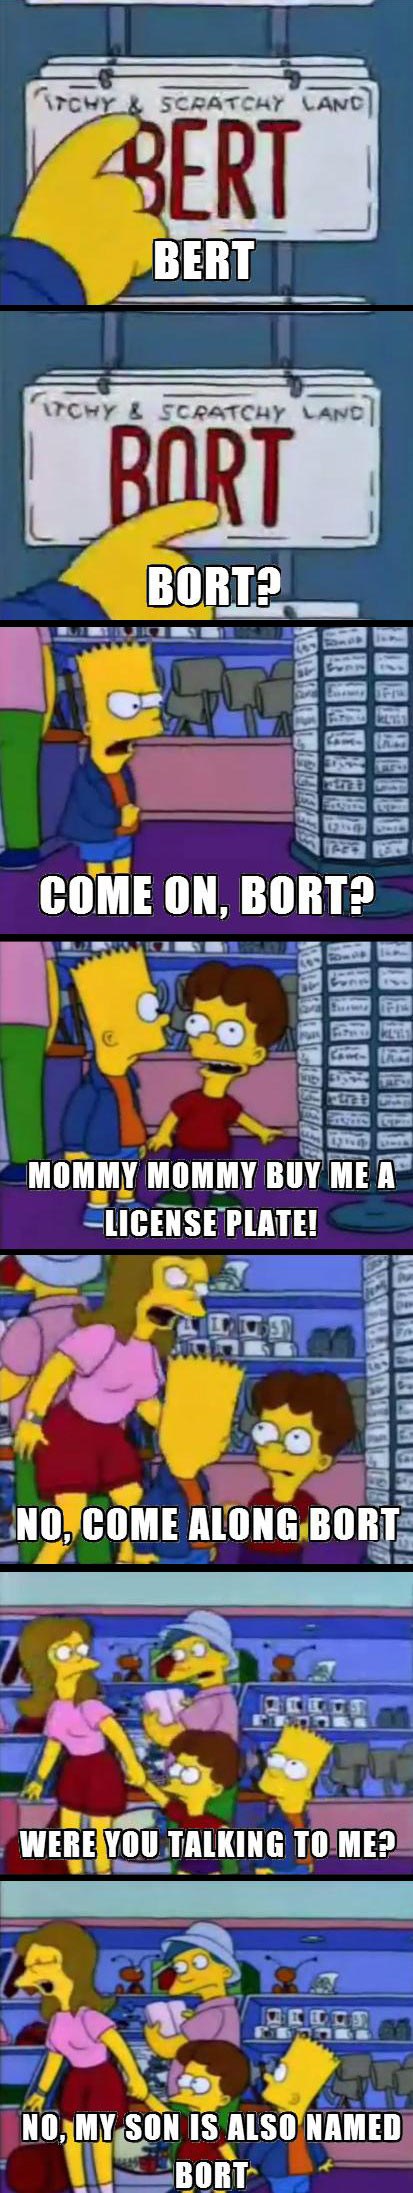 funny-Simpsons-Bart-Lisa-plates-Bort